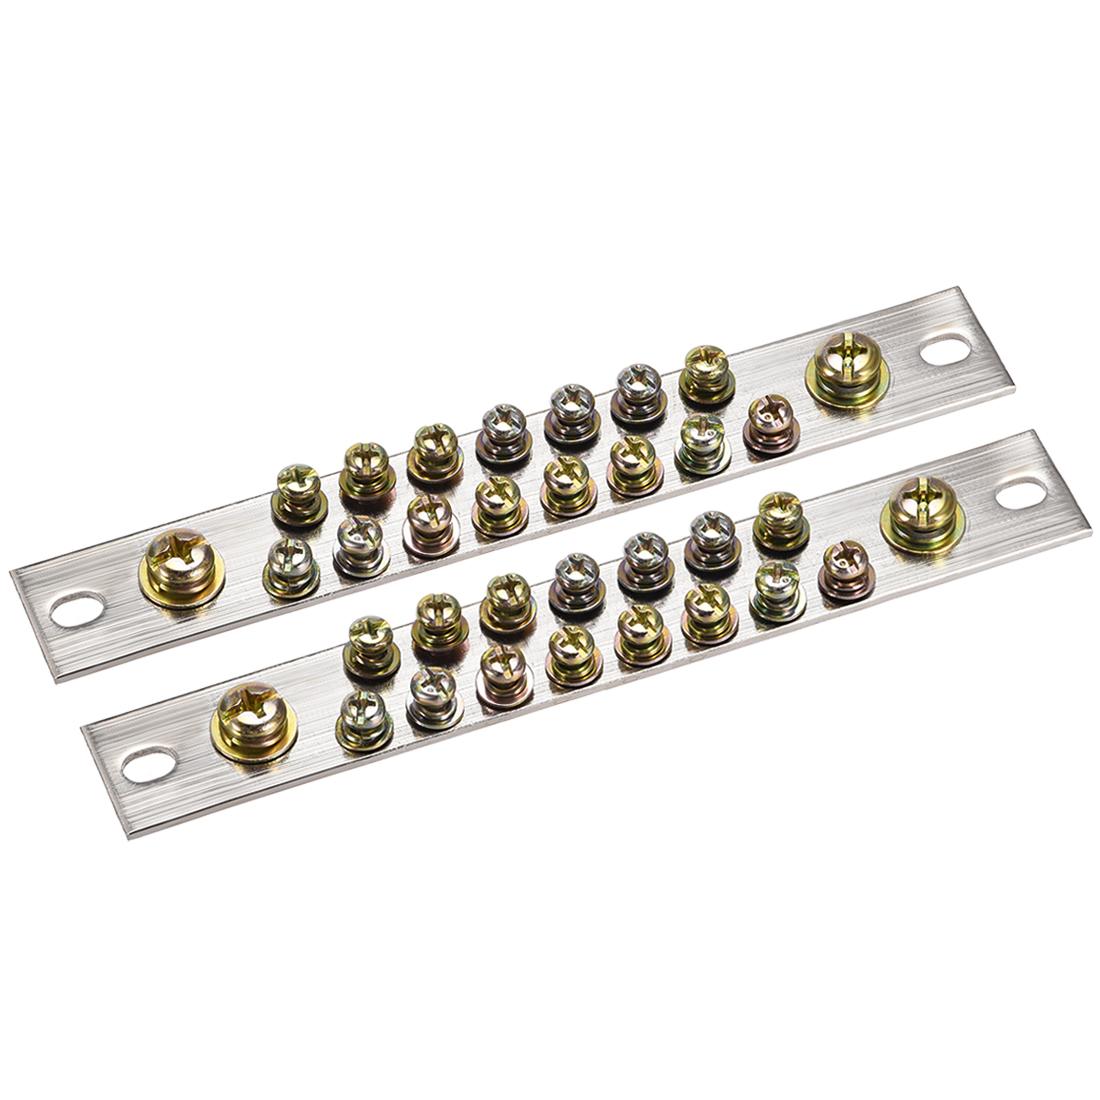 Copper Screw Terminal Block Connector Bar 100A Double Row 17 Positions 2 Pcs